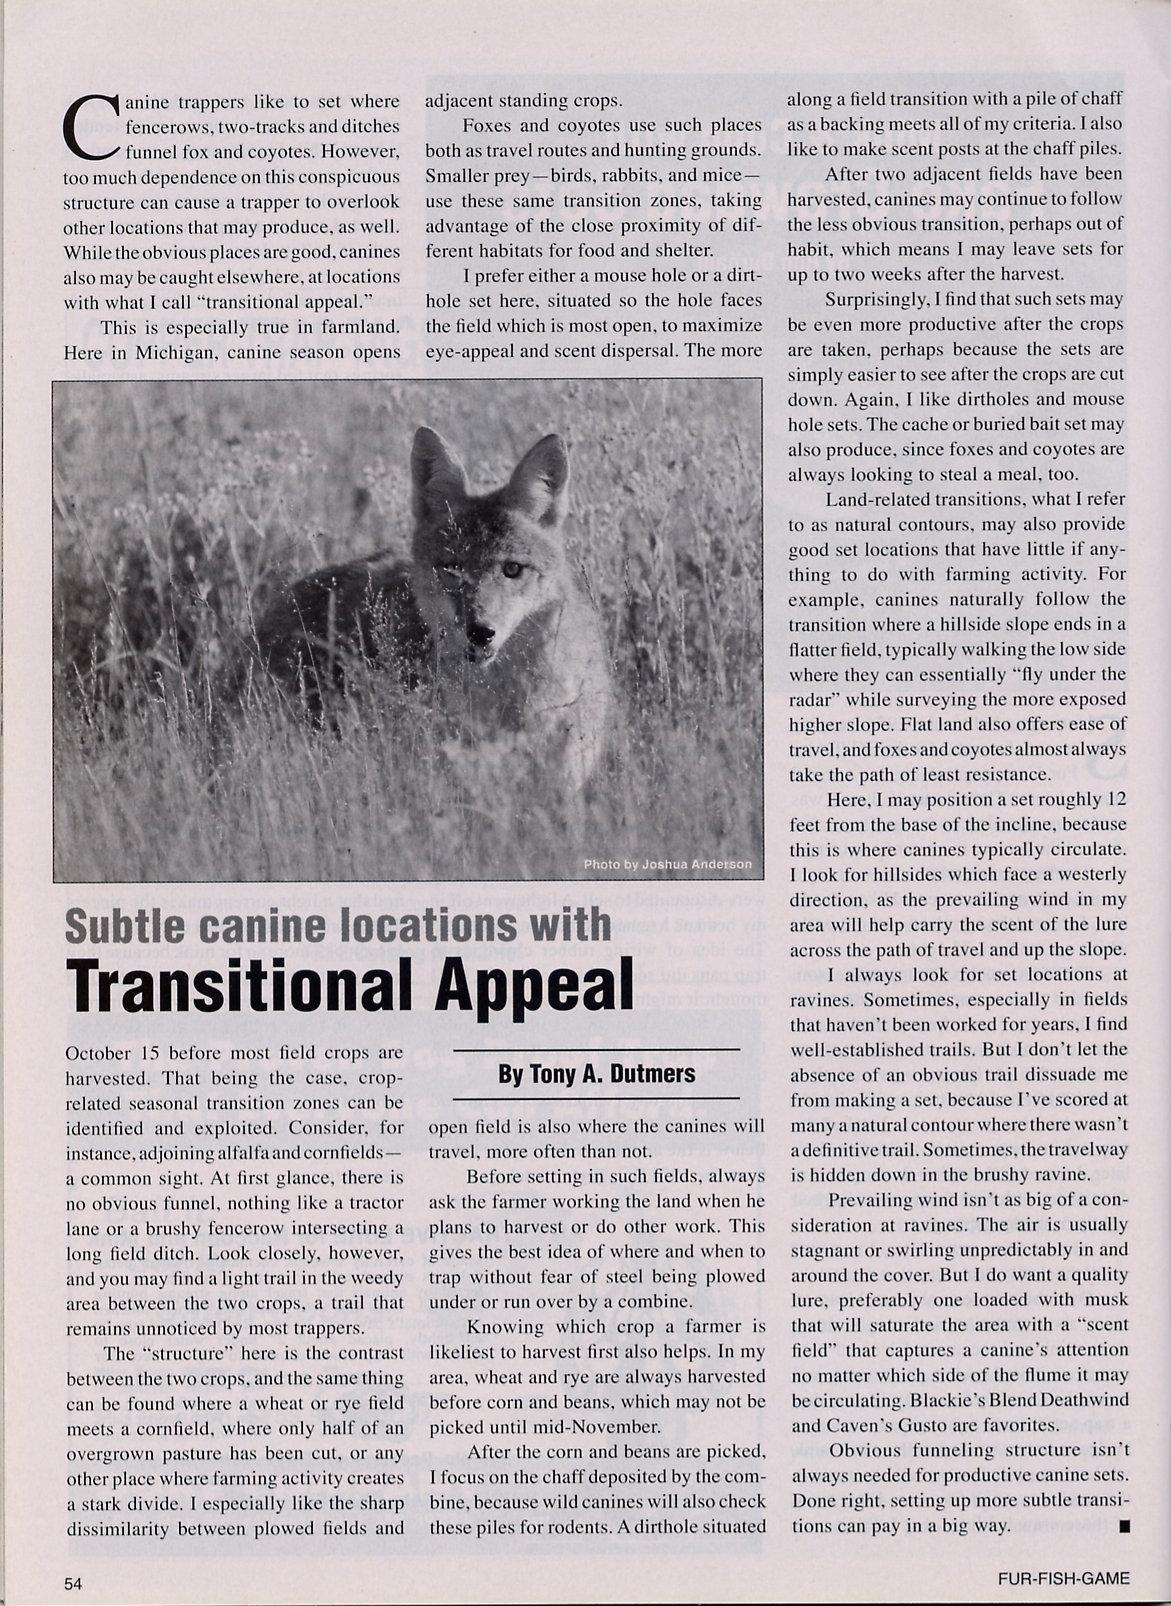 Fur-Fish-Game Magazine (inside); © September 2012